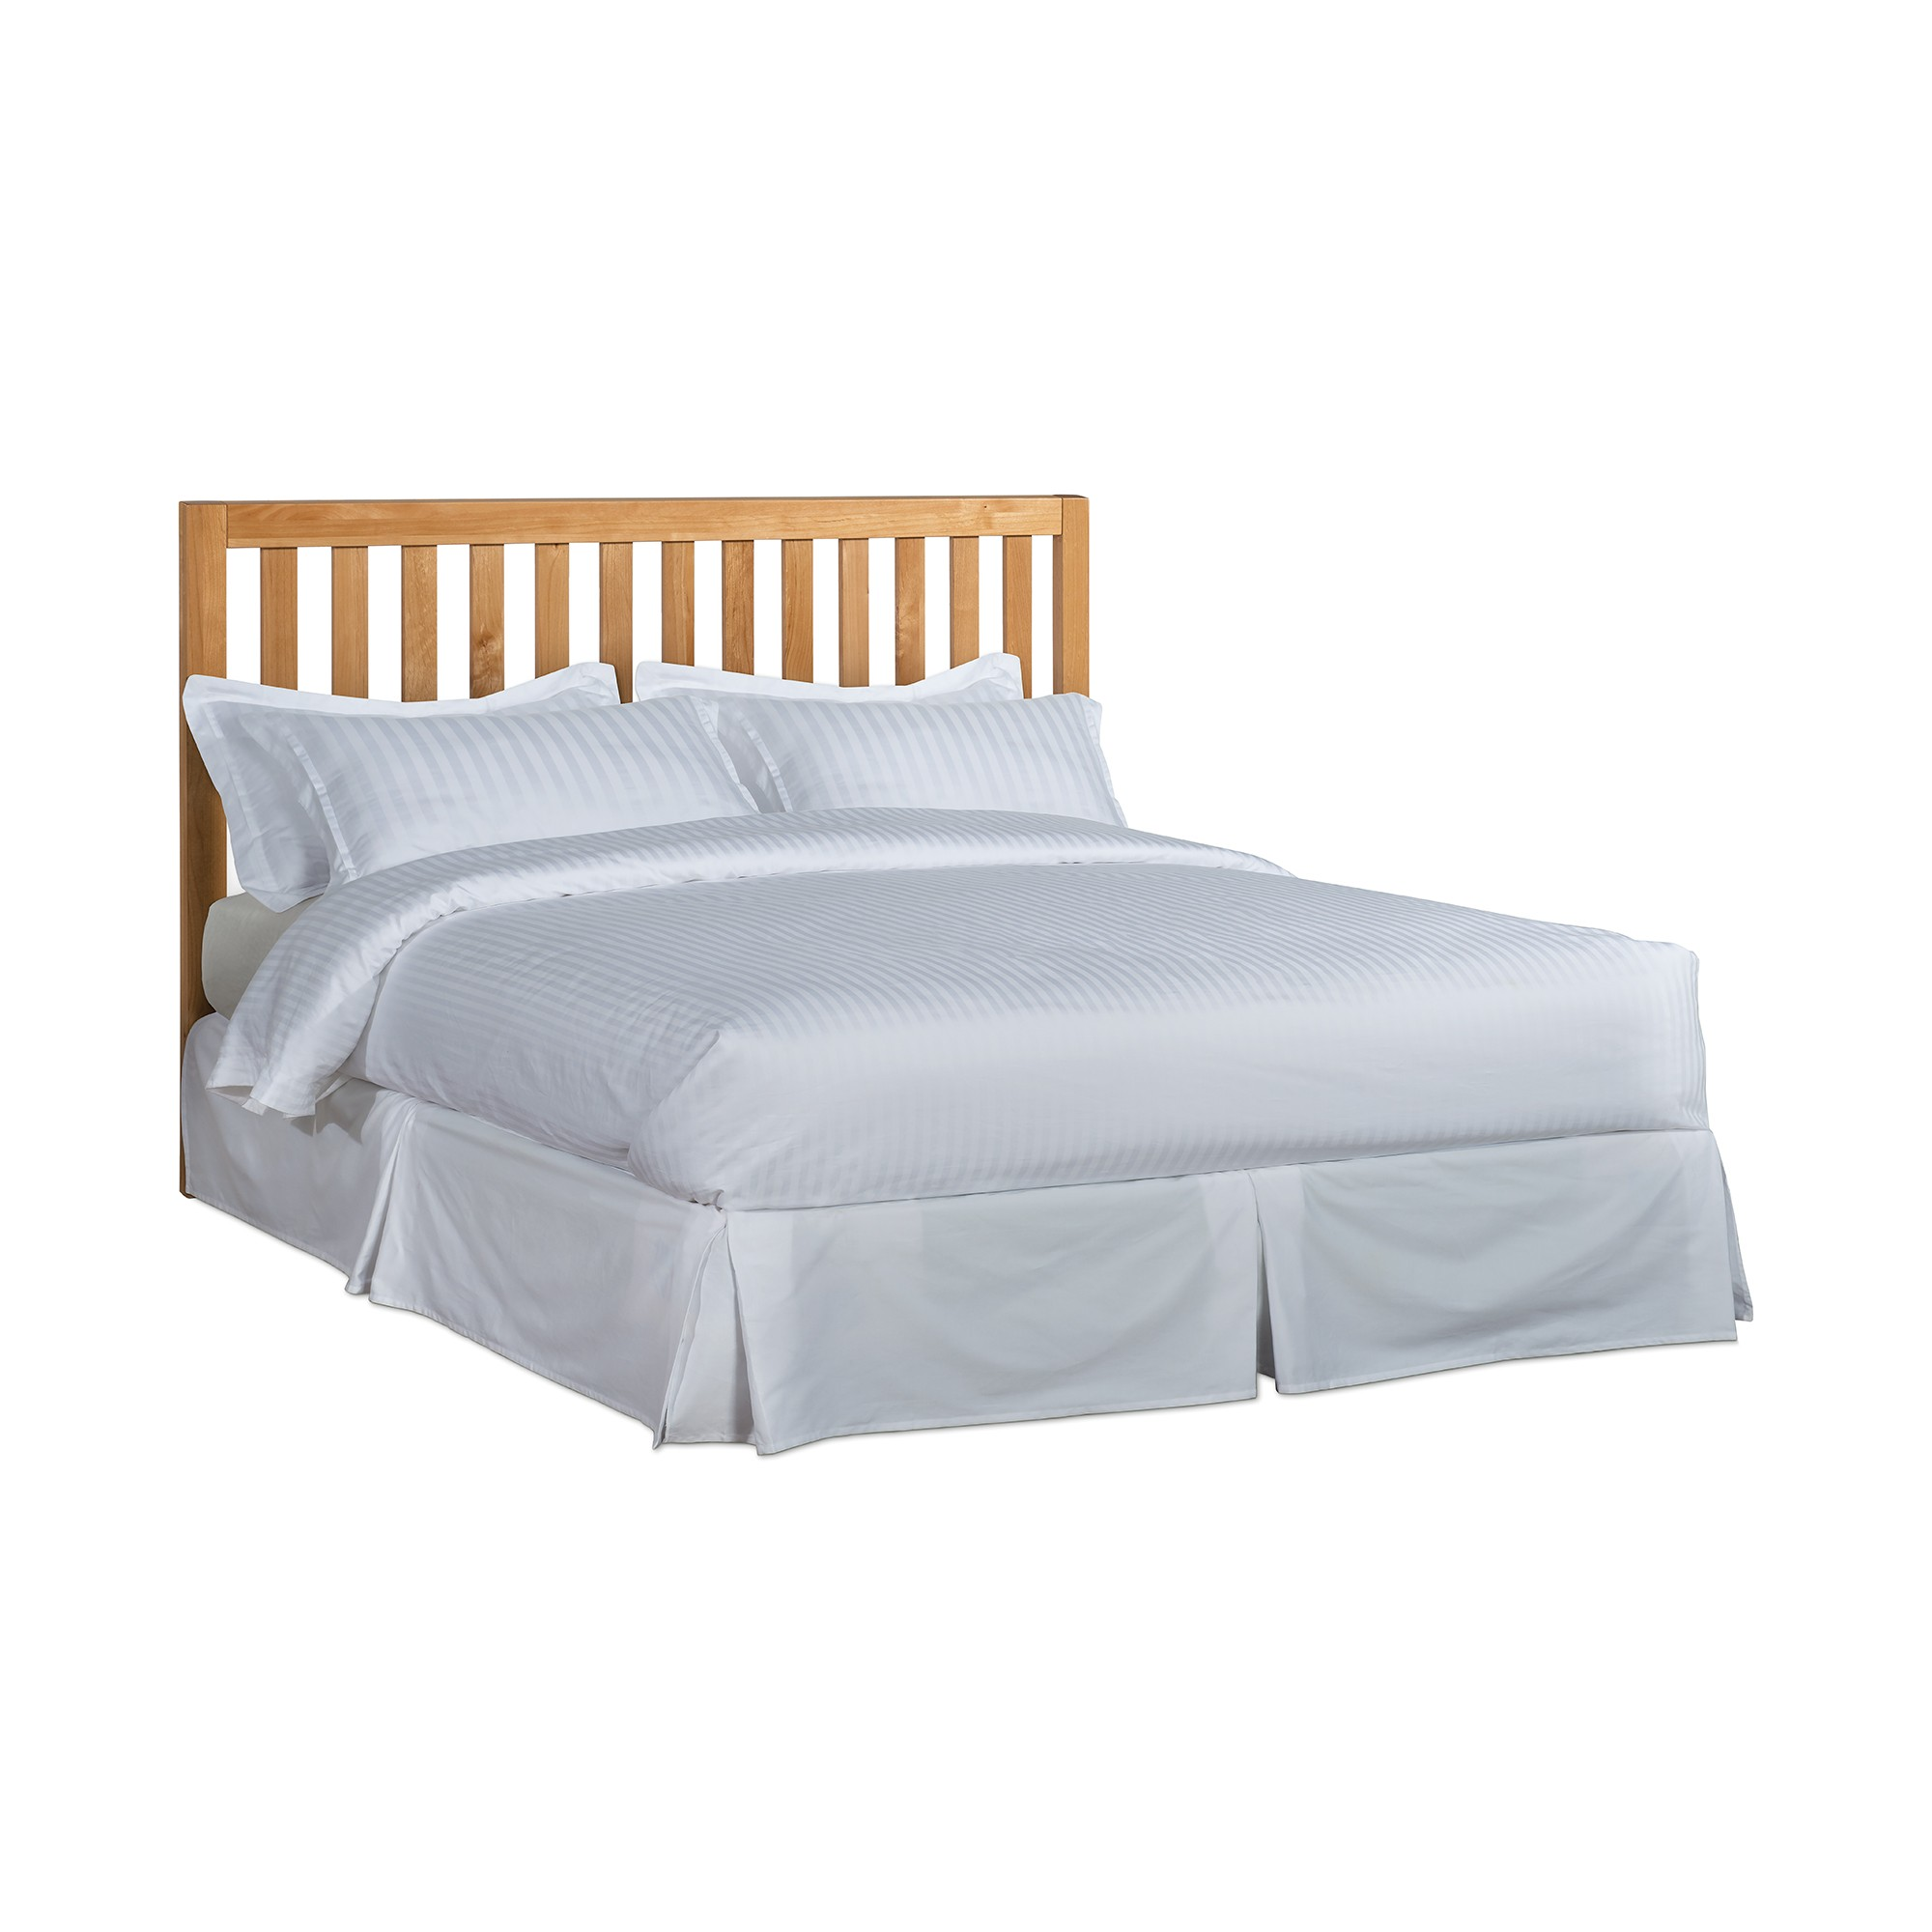 Baby crib mattress frame - 18